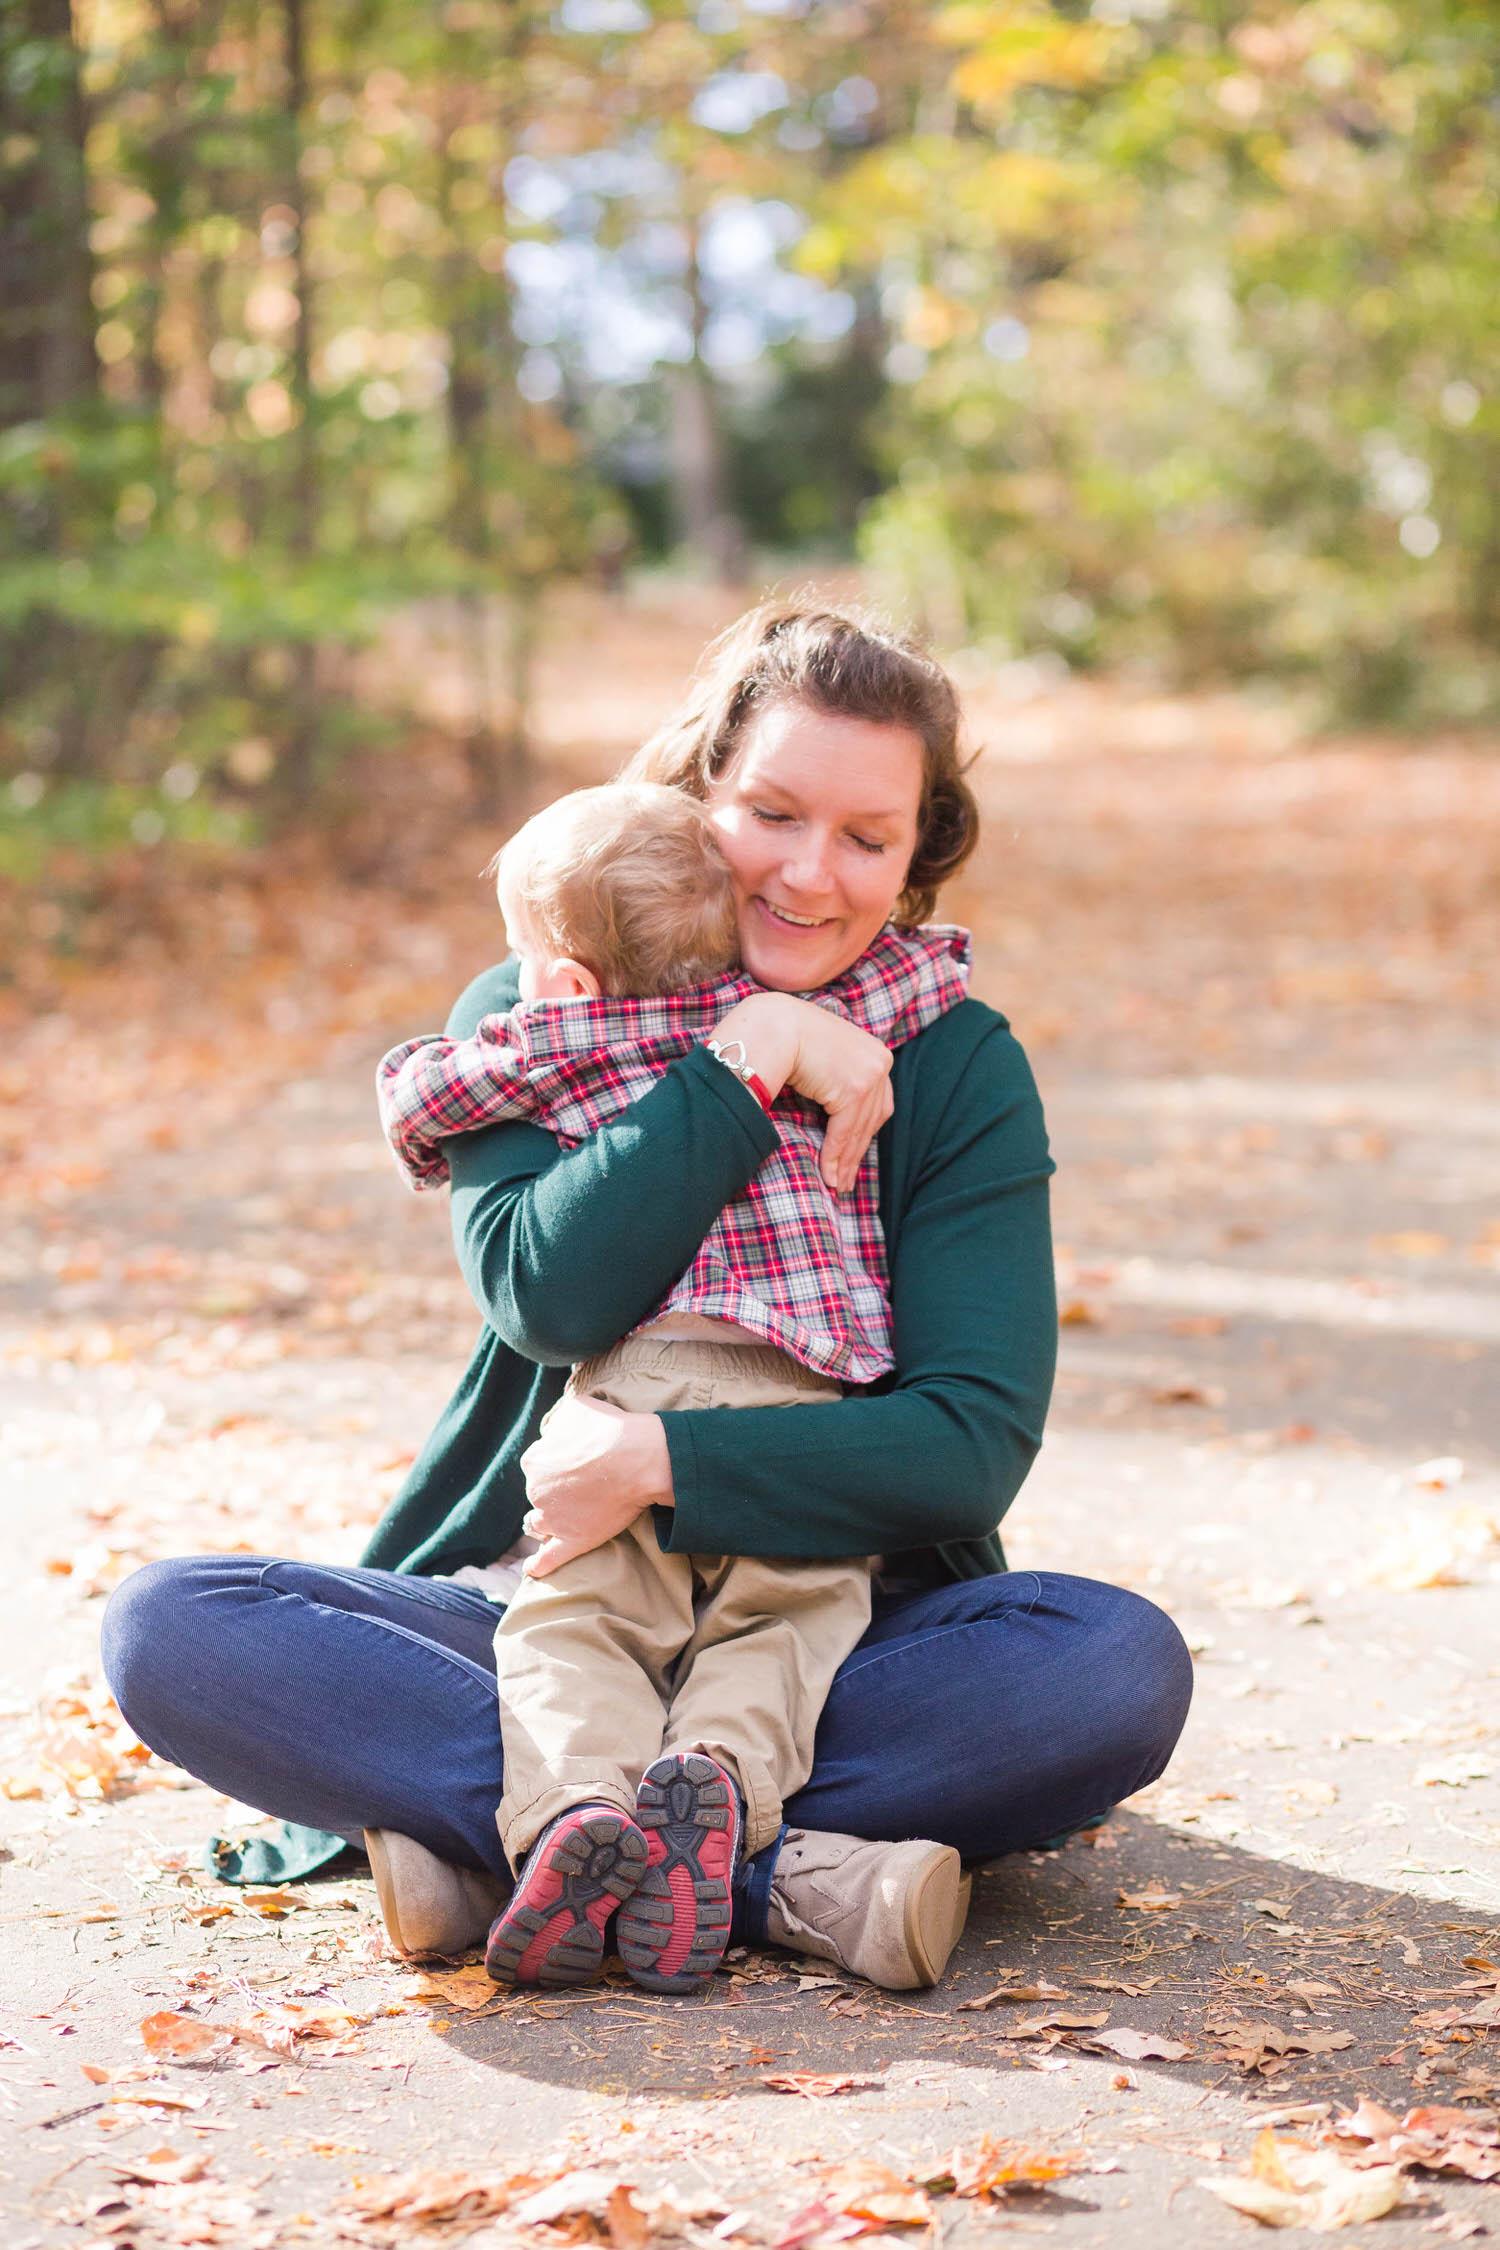 Ashley-AMBER-Photo-Greenville-Family-Photographer-161106-2.jpg